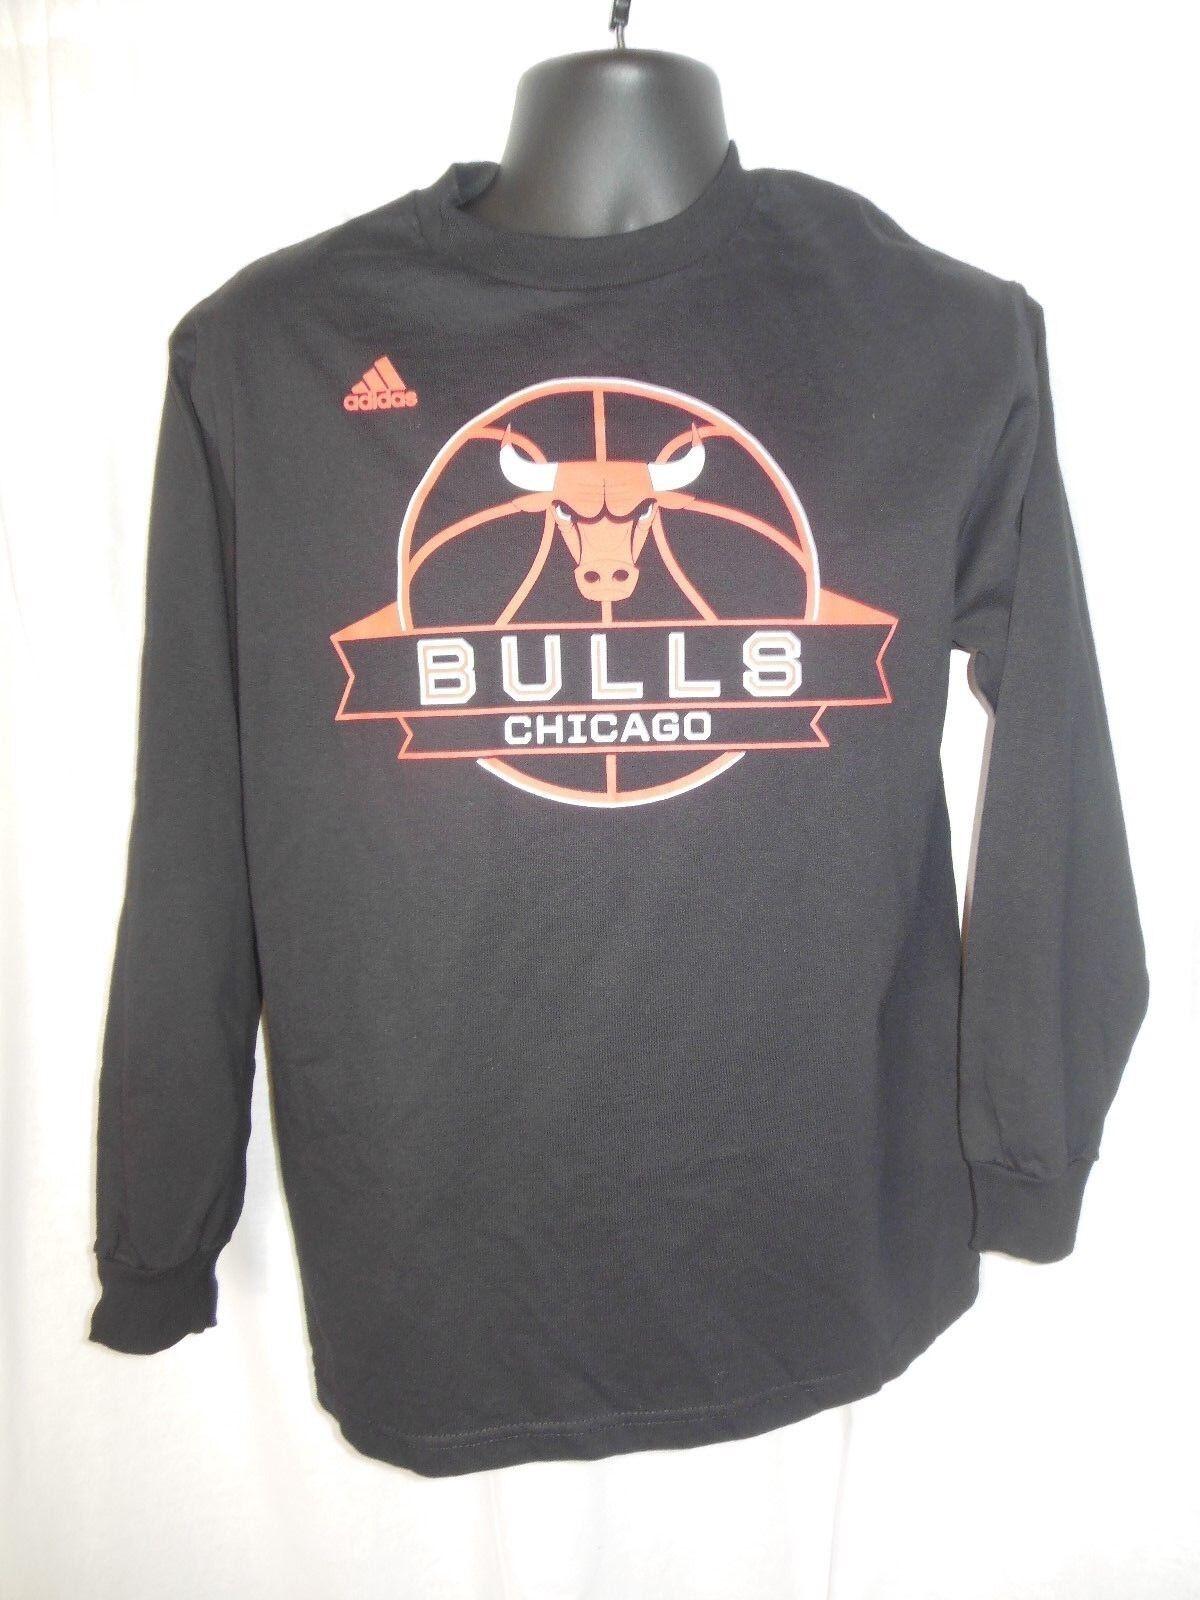 Camiseta de manga larga Adidas para hombre de los Chicago Bulls, tamaño medio